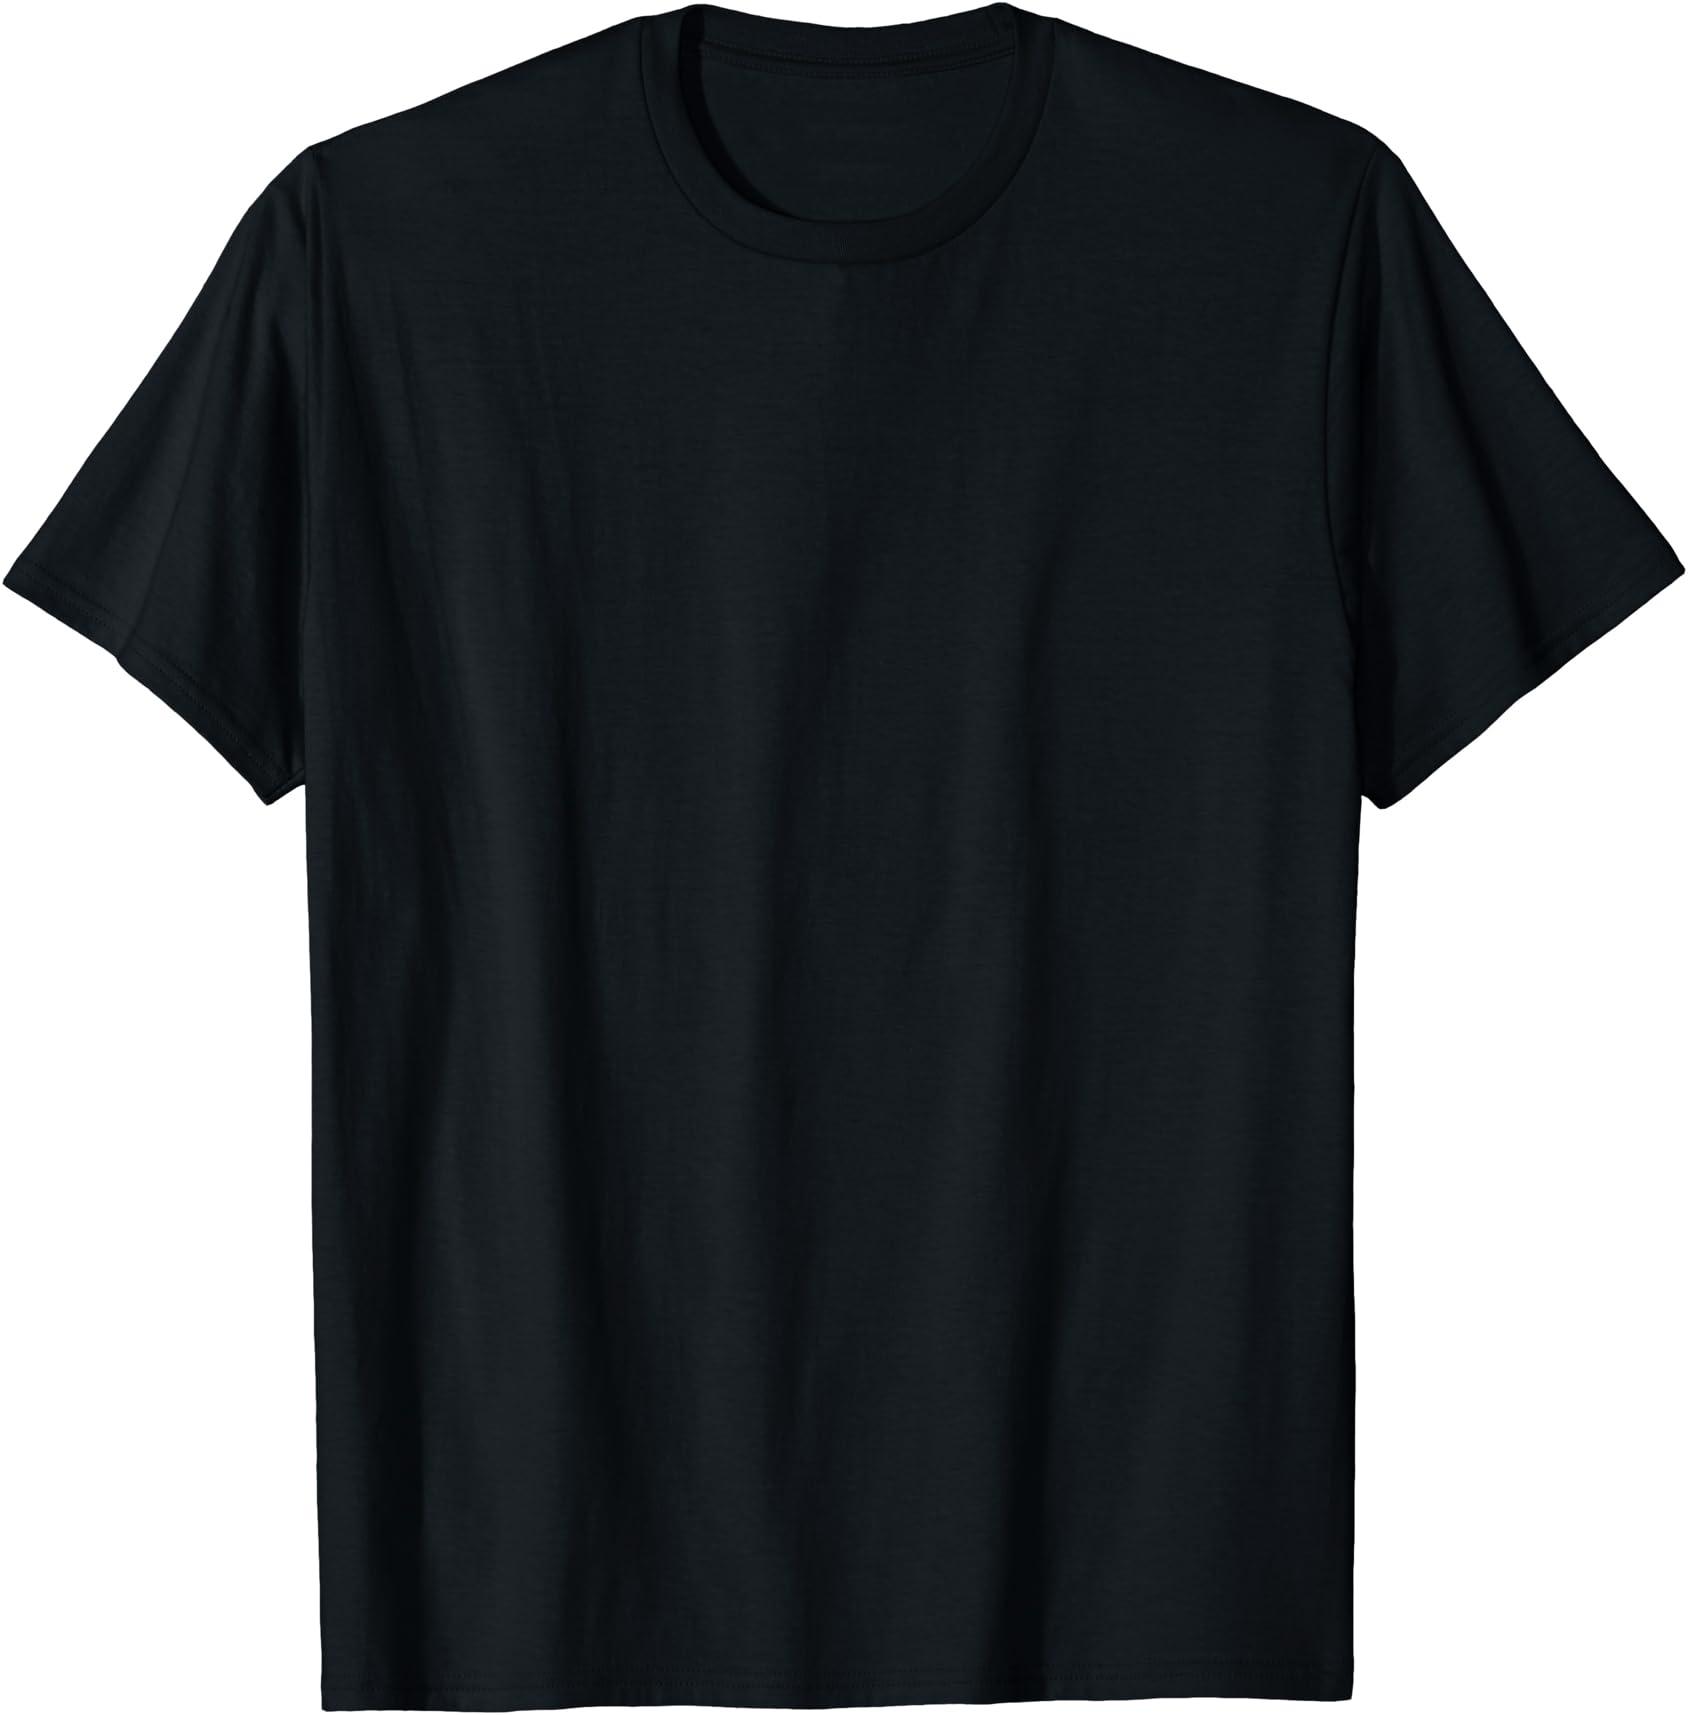 The Bike Classic Pinarello Cotton Tees Sz S-3XL Black Men/'s T-shirts